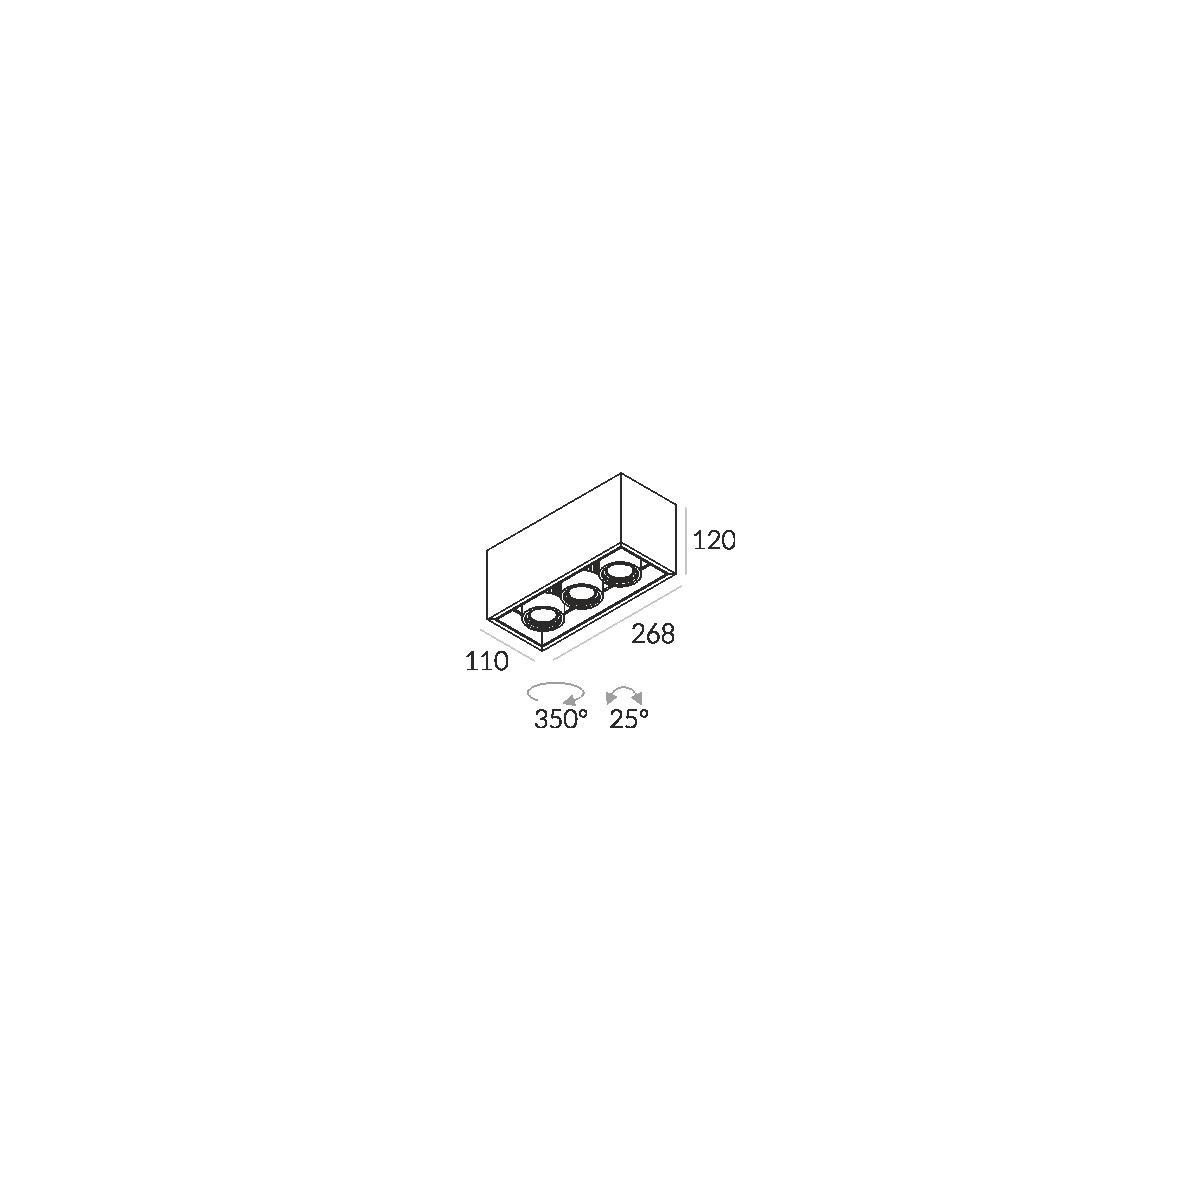 Labra SOLID 110.3 NT GU10 3-0706 Sufitowa